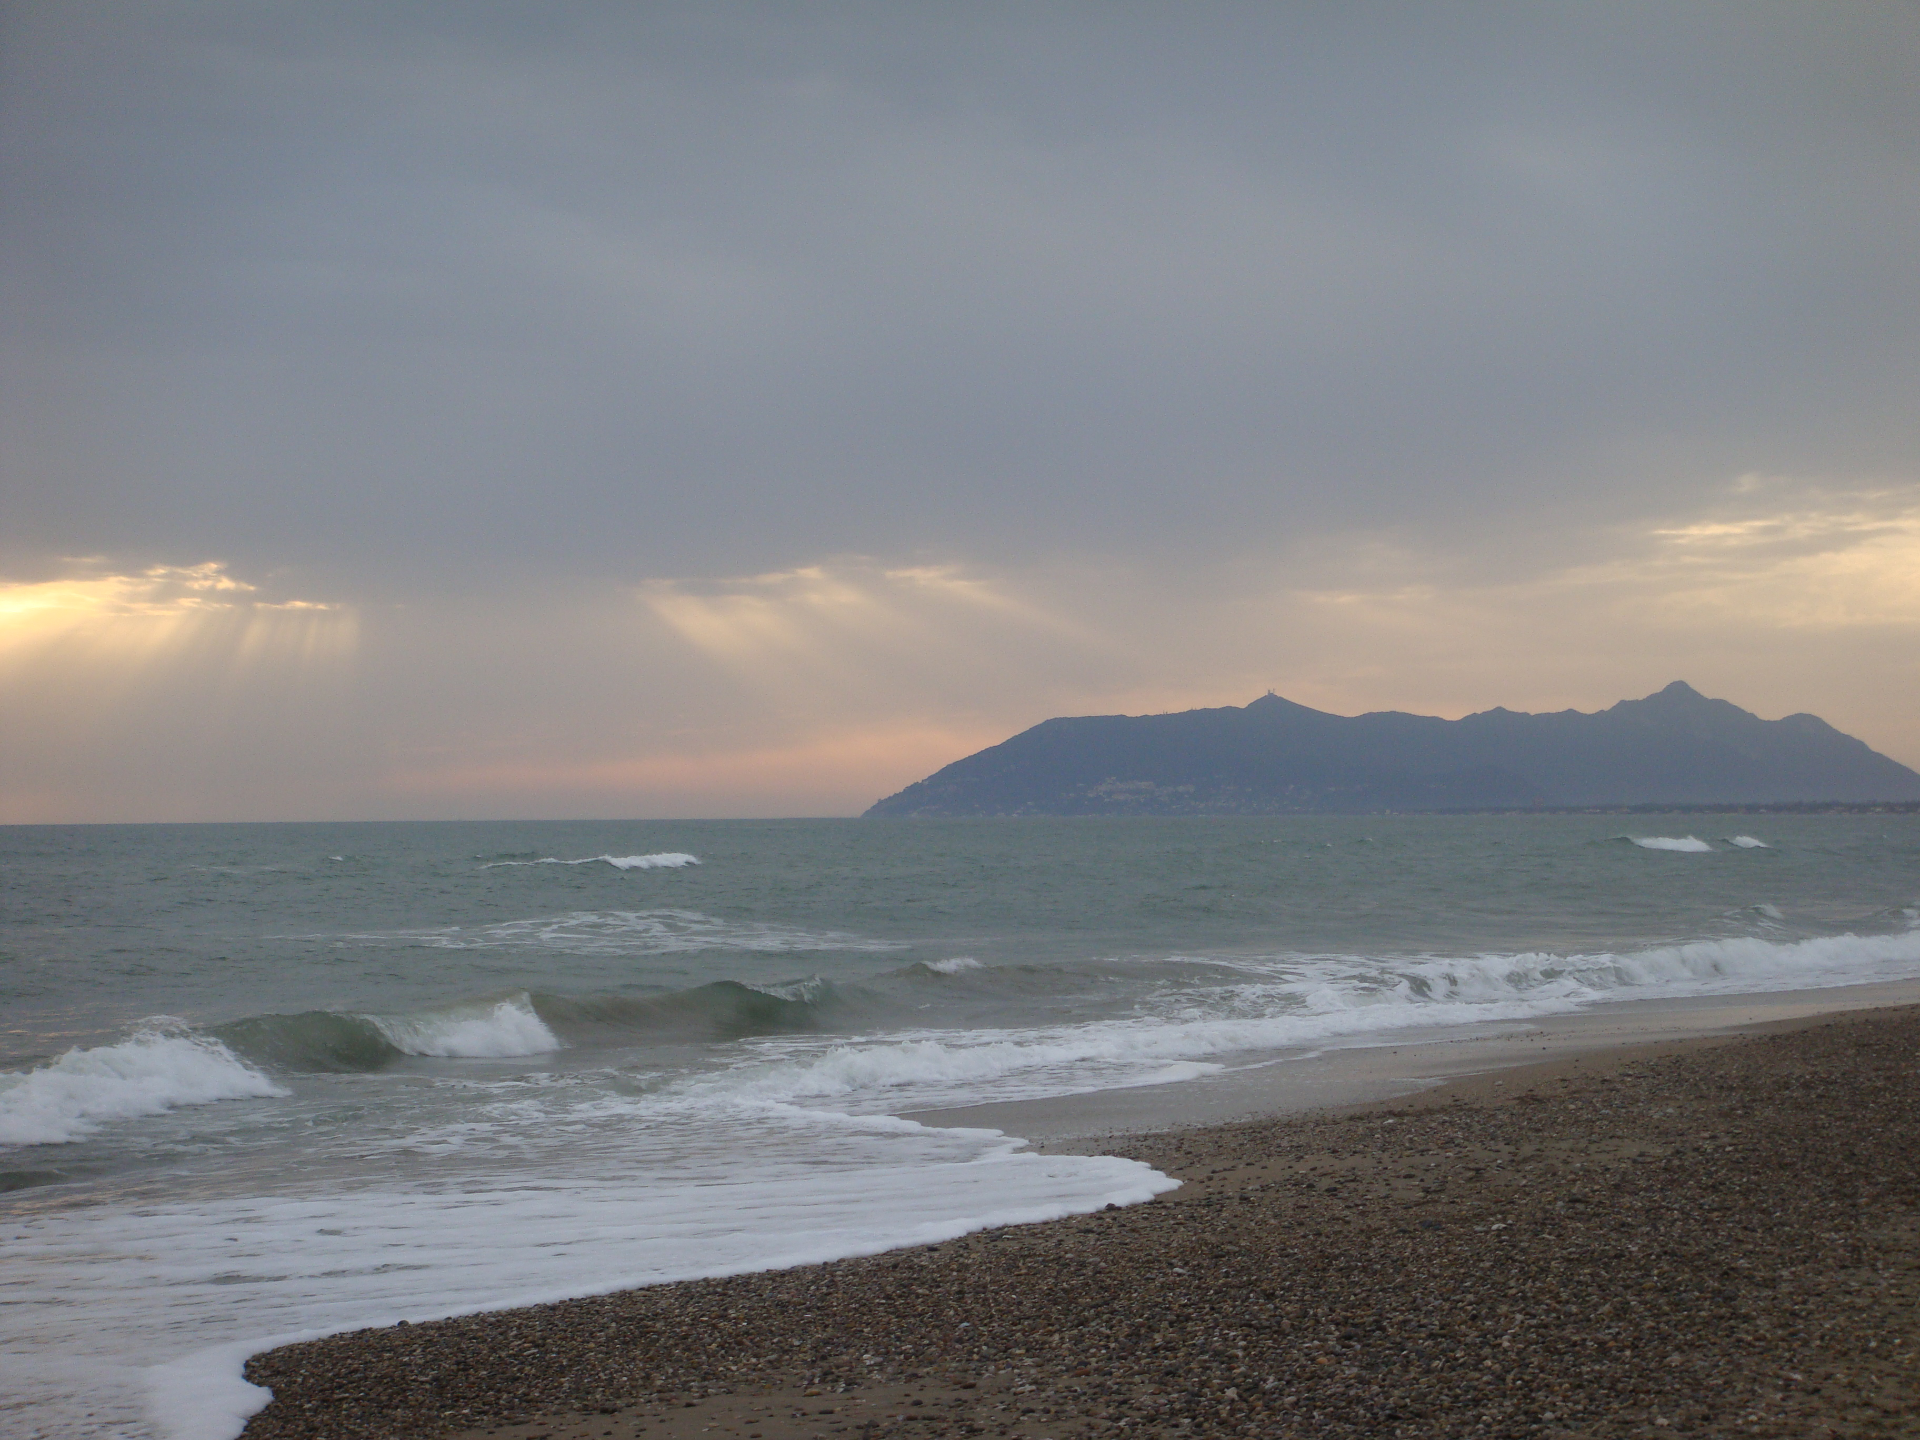 Surfcasting Lazio: Terracina